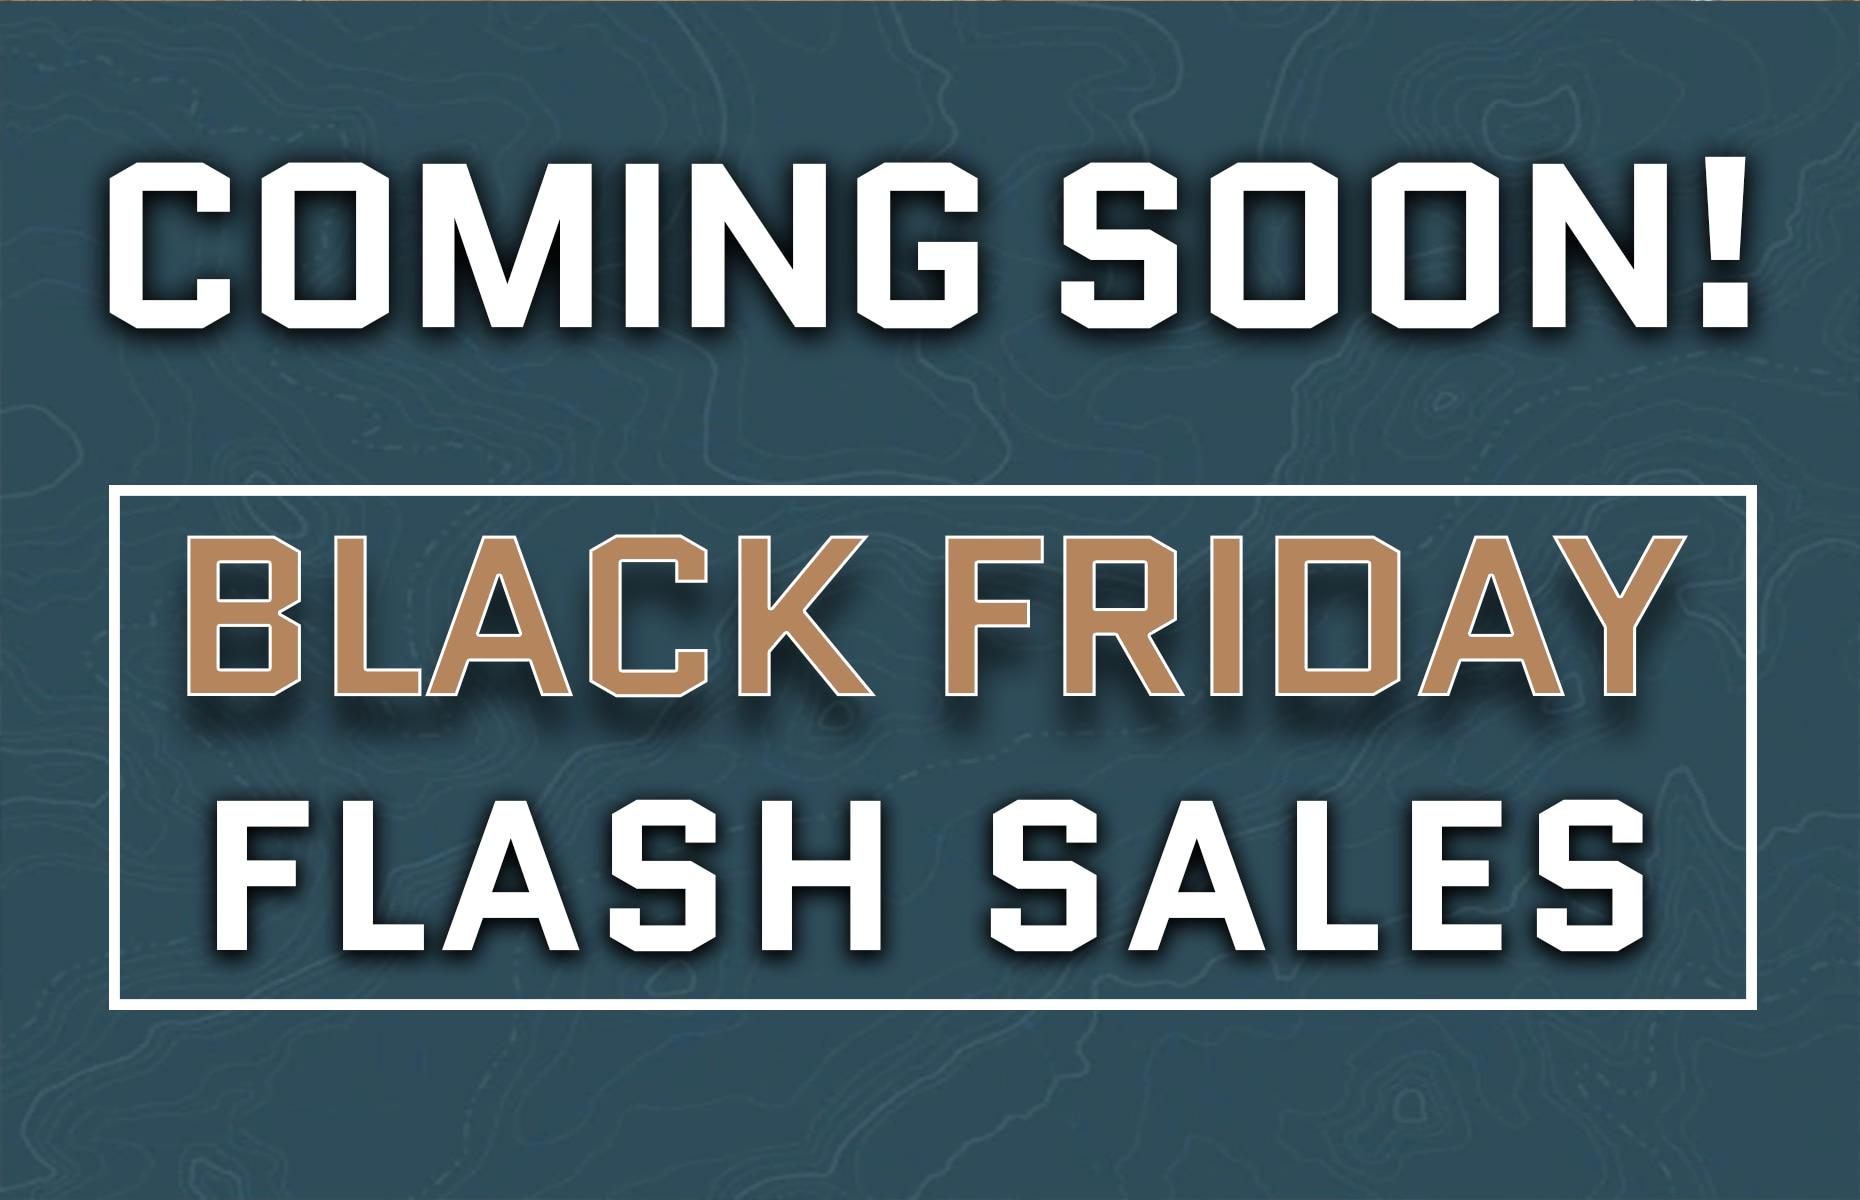 Coming Soon - Black Friday